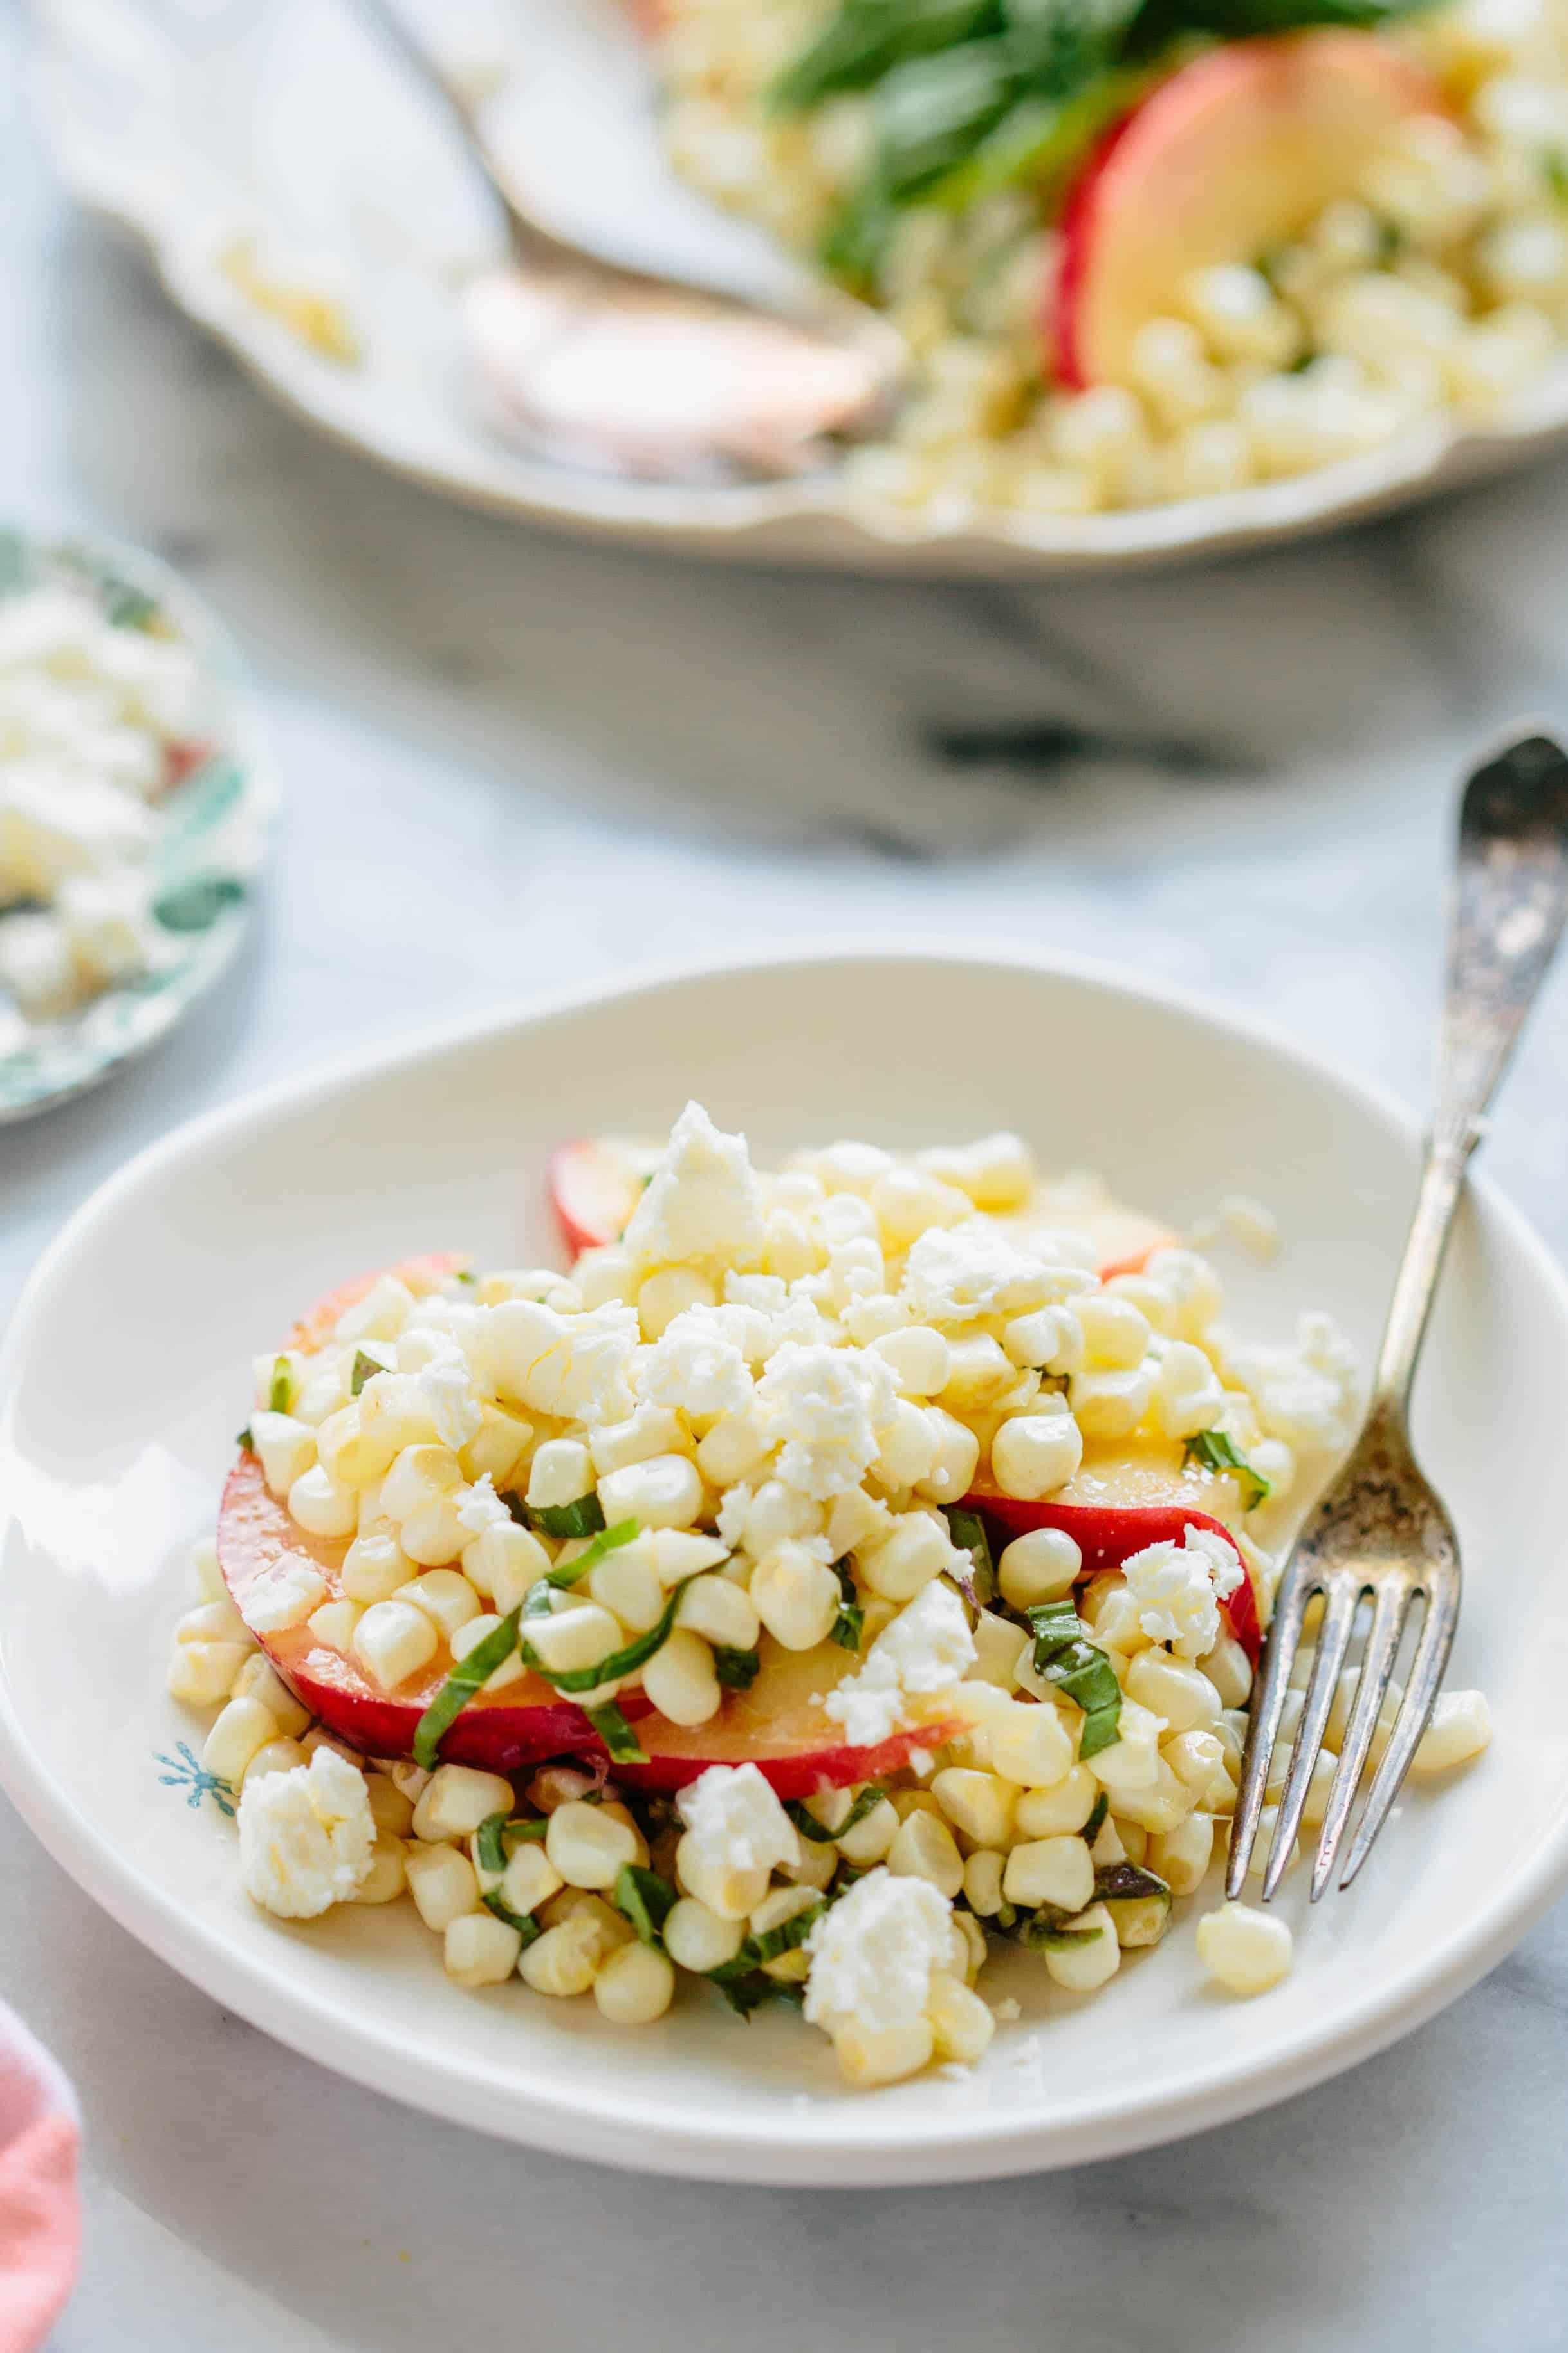 RAW CORN + NECTARINE SALAD. Easy summer salad recipe with beautiful raw sweet corn, juicy ripe nectarines + fresh basil - vegan + gluten free! #easy #glutenfree #planbased #vegan #recipe #summer #salad #corn #nectarines | ColeyCooks.com.jpg